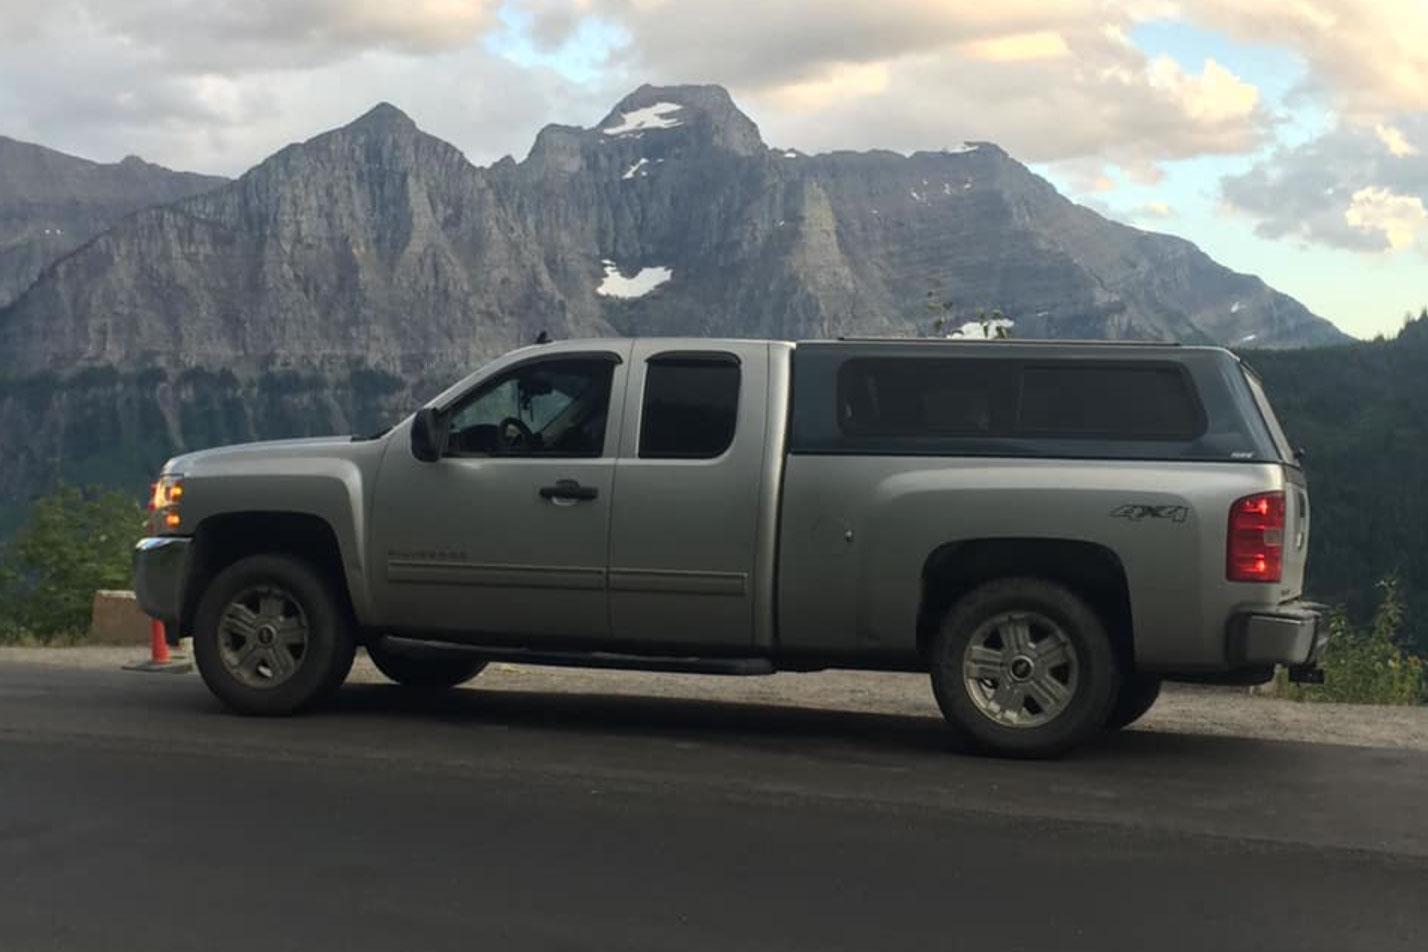 Getting back stolen truck